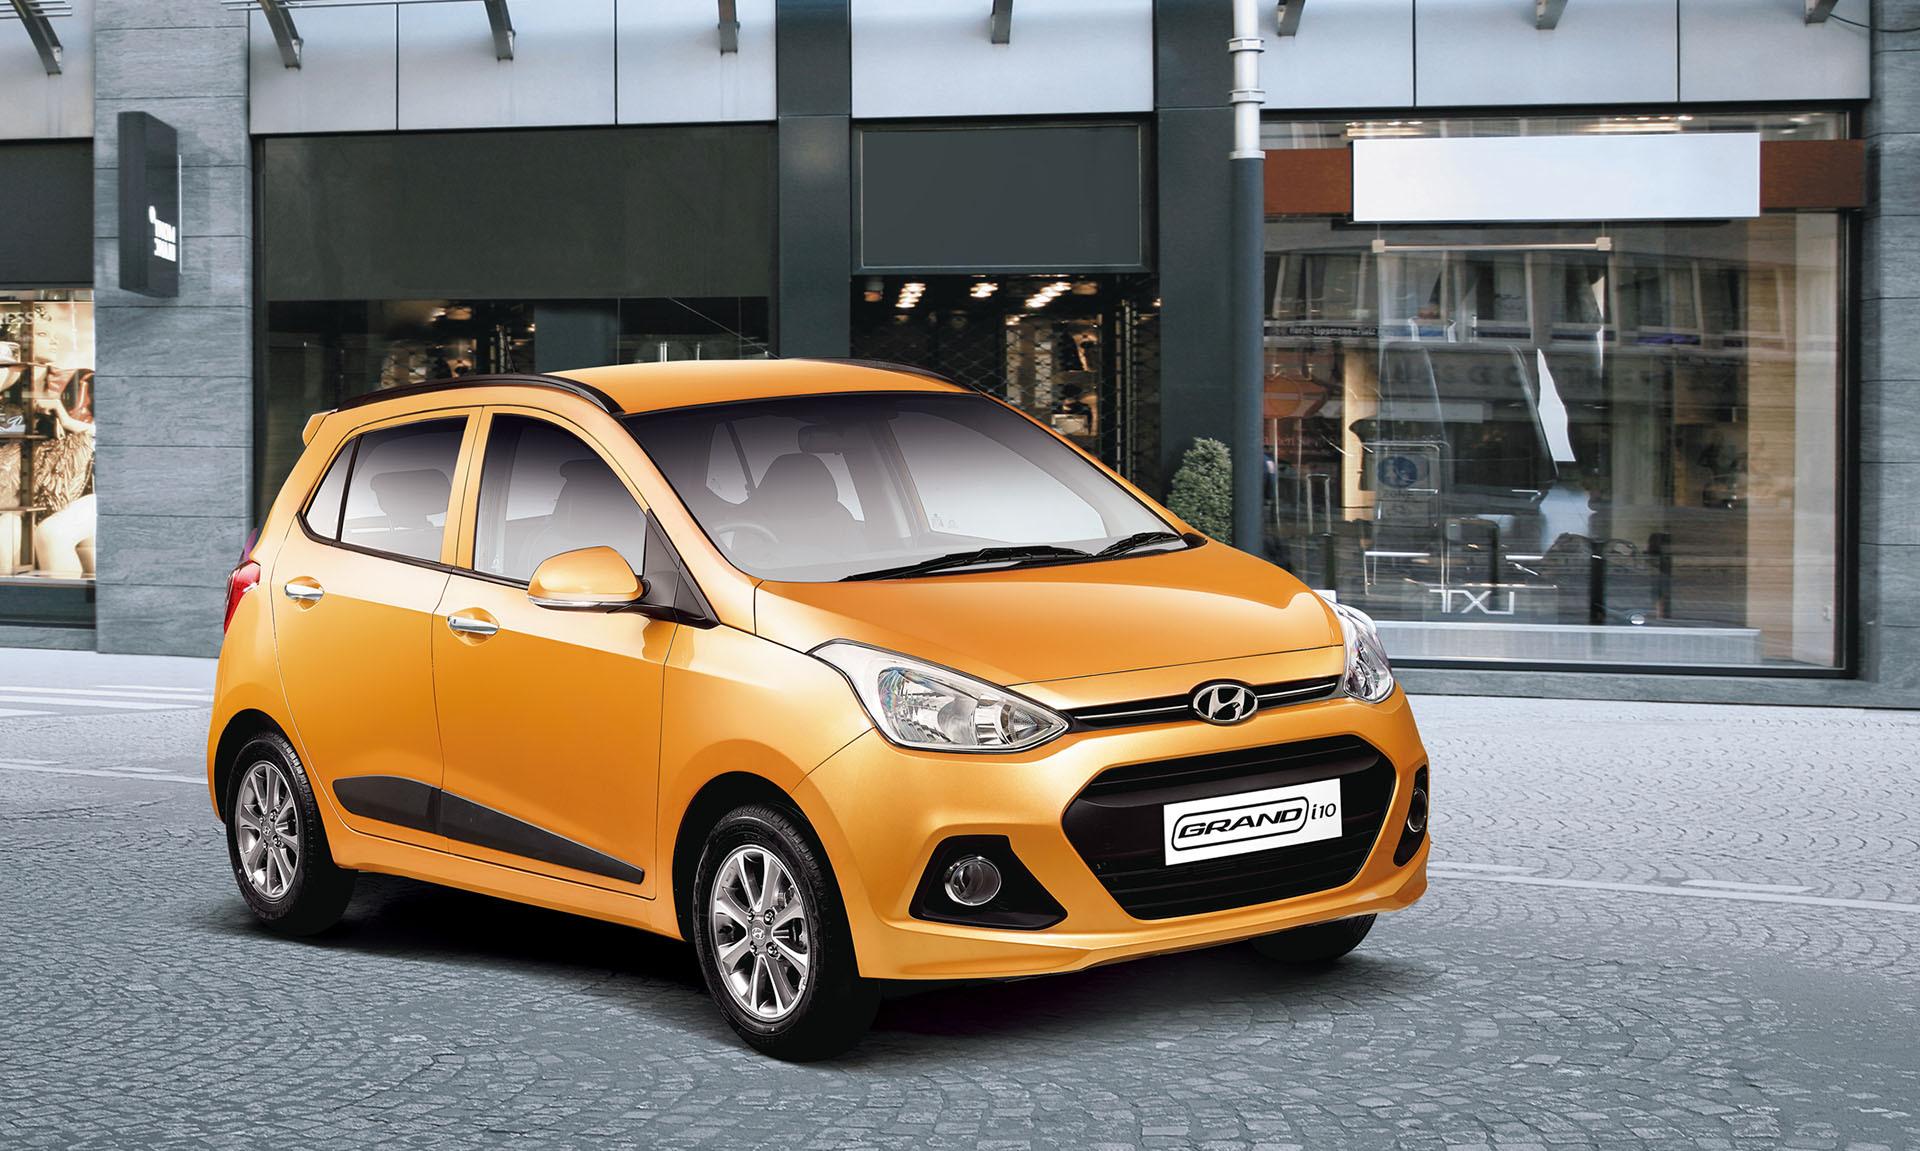 Hyundai creta price starts from 8 59 lakhs launched in india - Hyundai Grand I10 2015 Photos